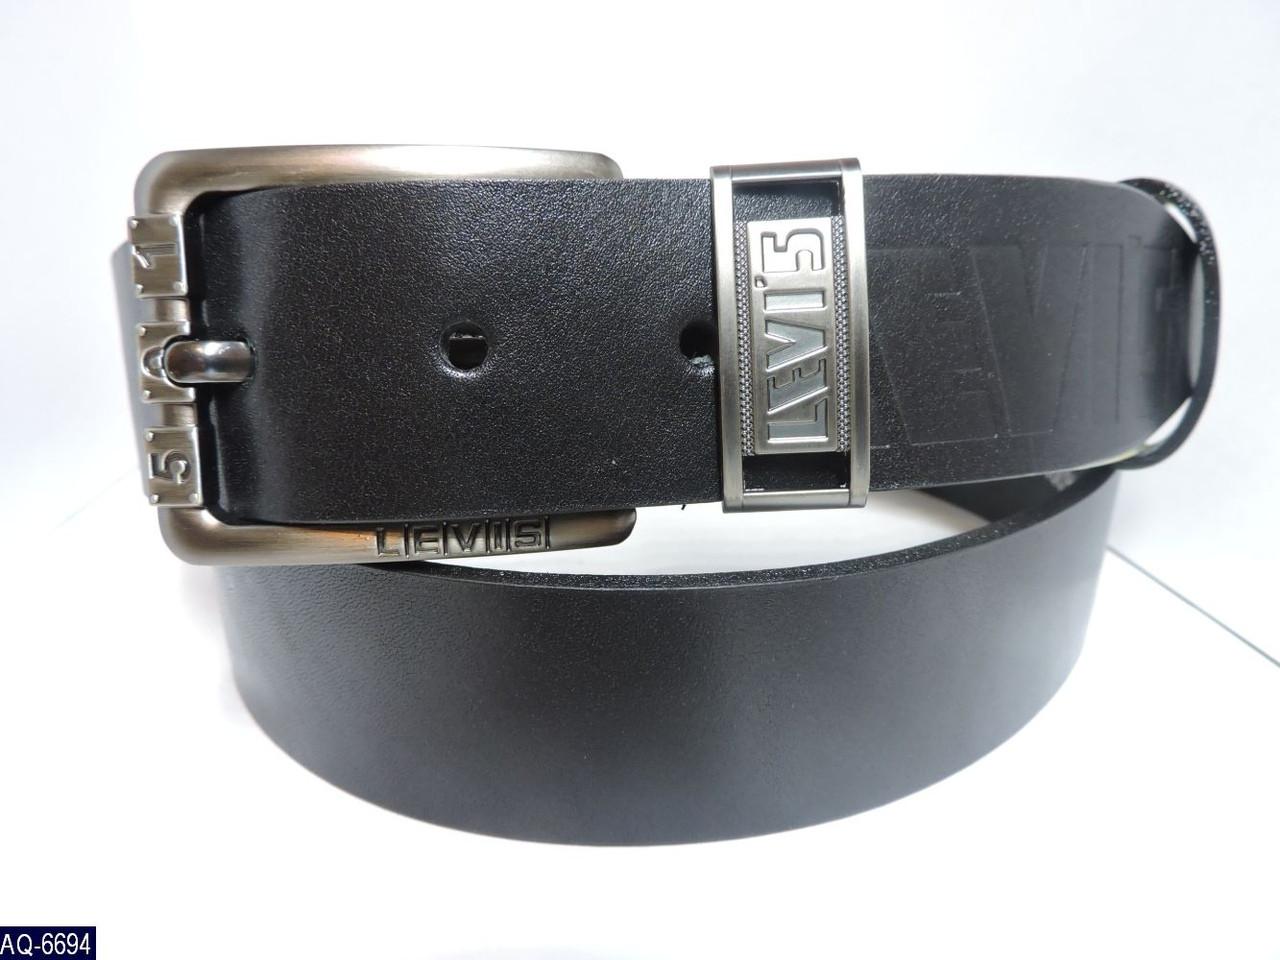 Ремень Levis кожа бренд Ширина -4 см длина 115-125